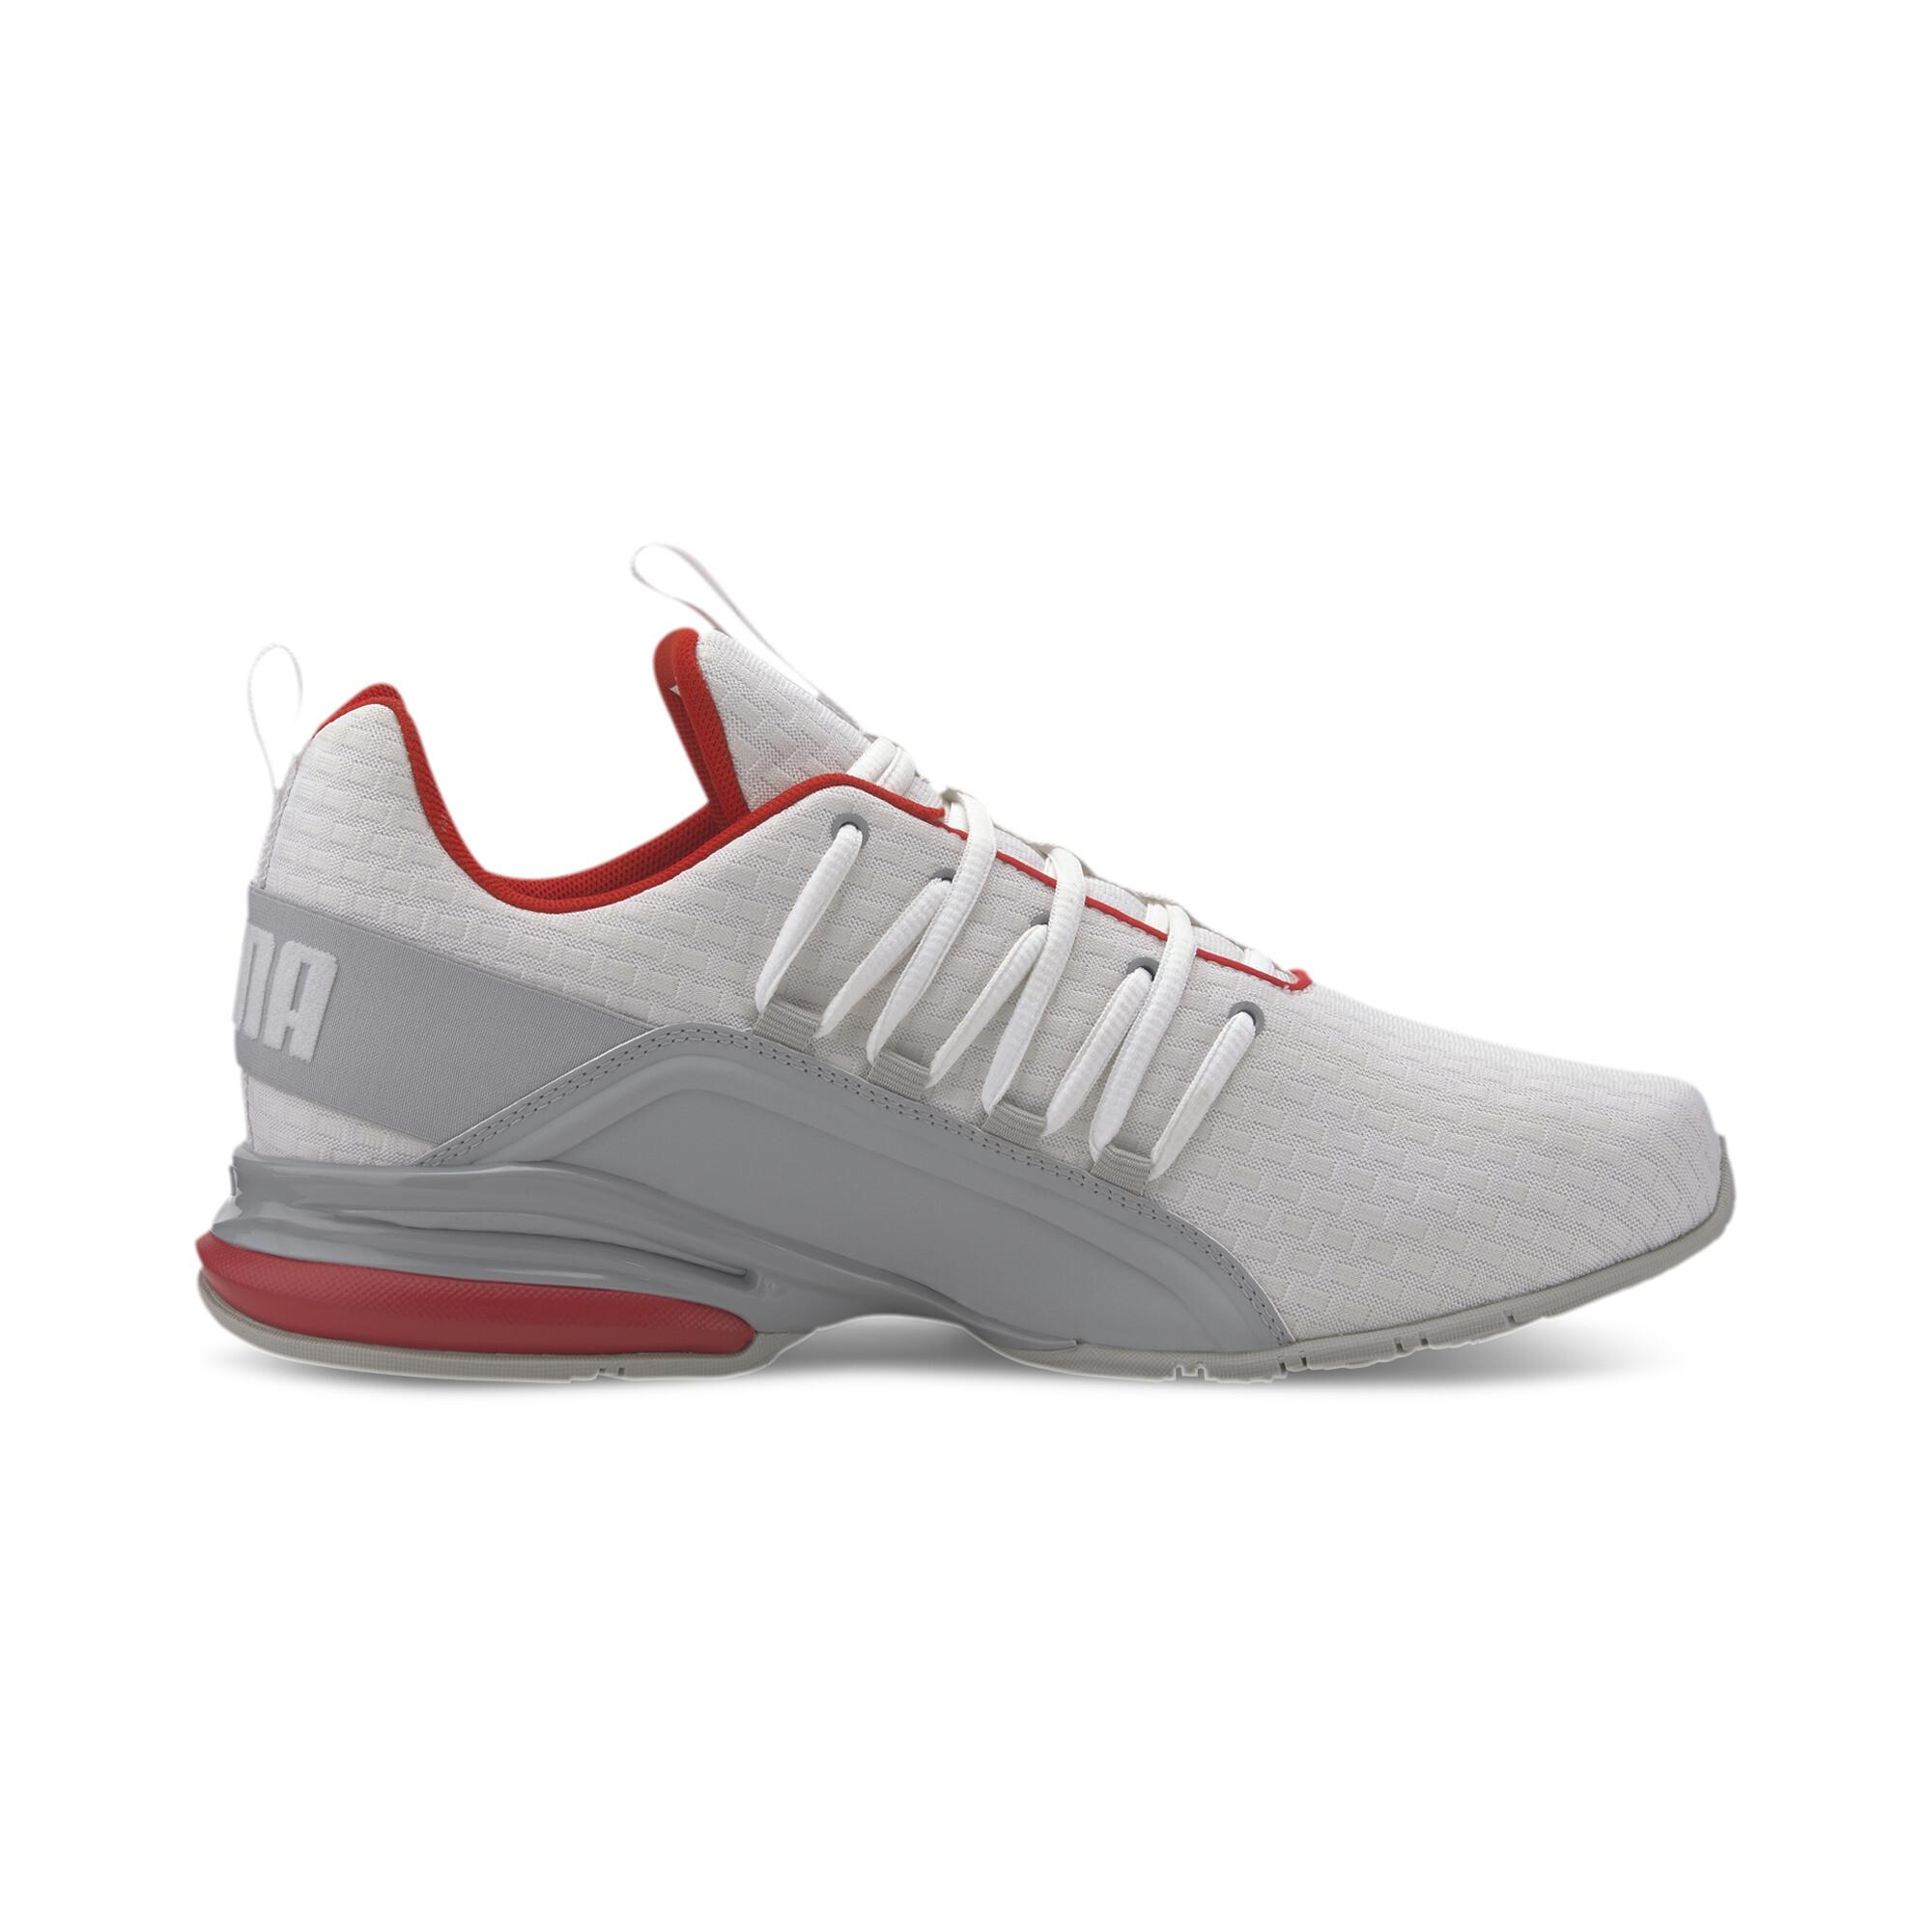 PUMA-Men-039-s-Axelion-Block-Running-Shoes thumbnail 14